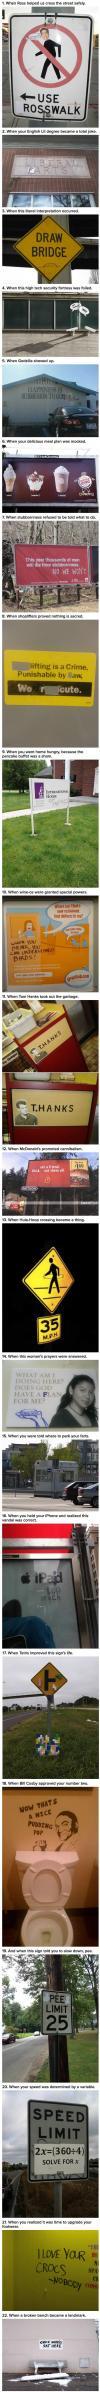 22 times when vandalism won